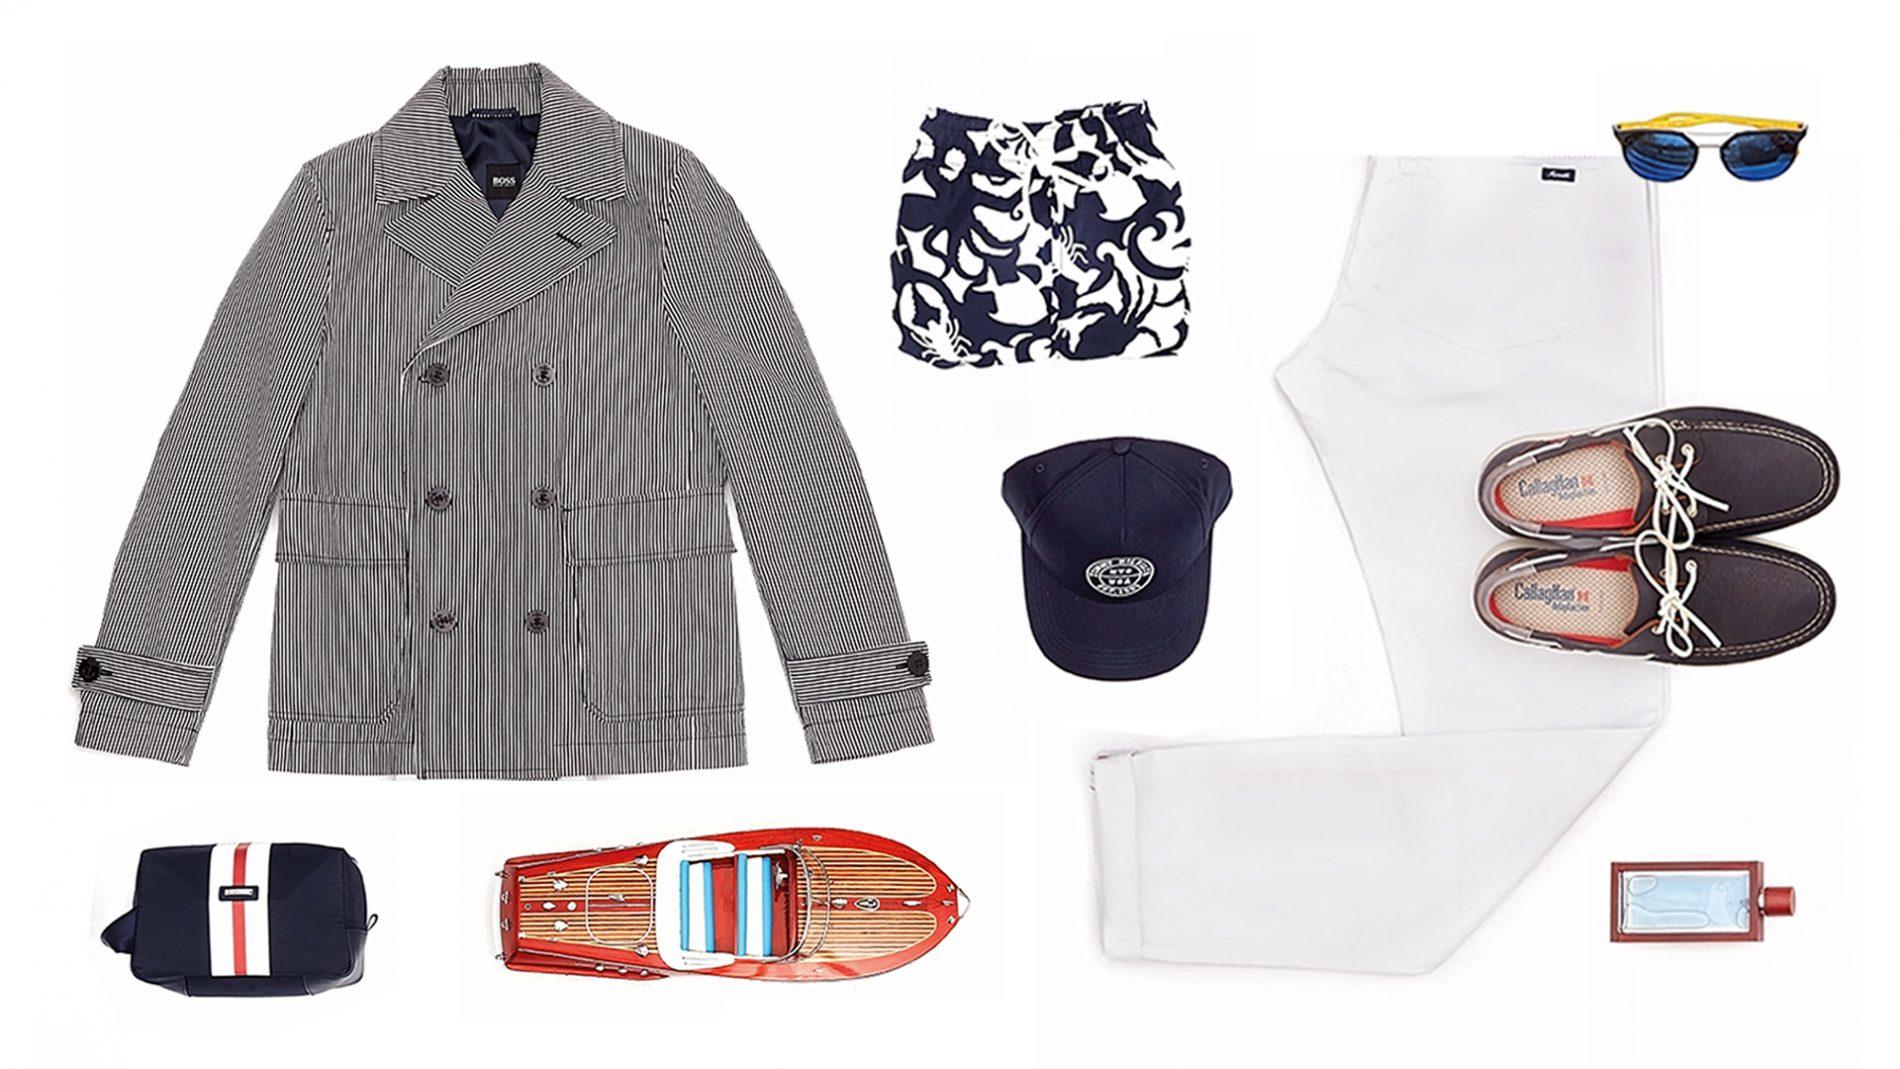 El Corte Inglés Menswear Ralph Lauren Prada Hugo Boss Tommy Hilfiger